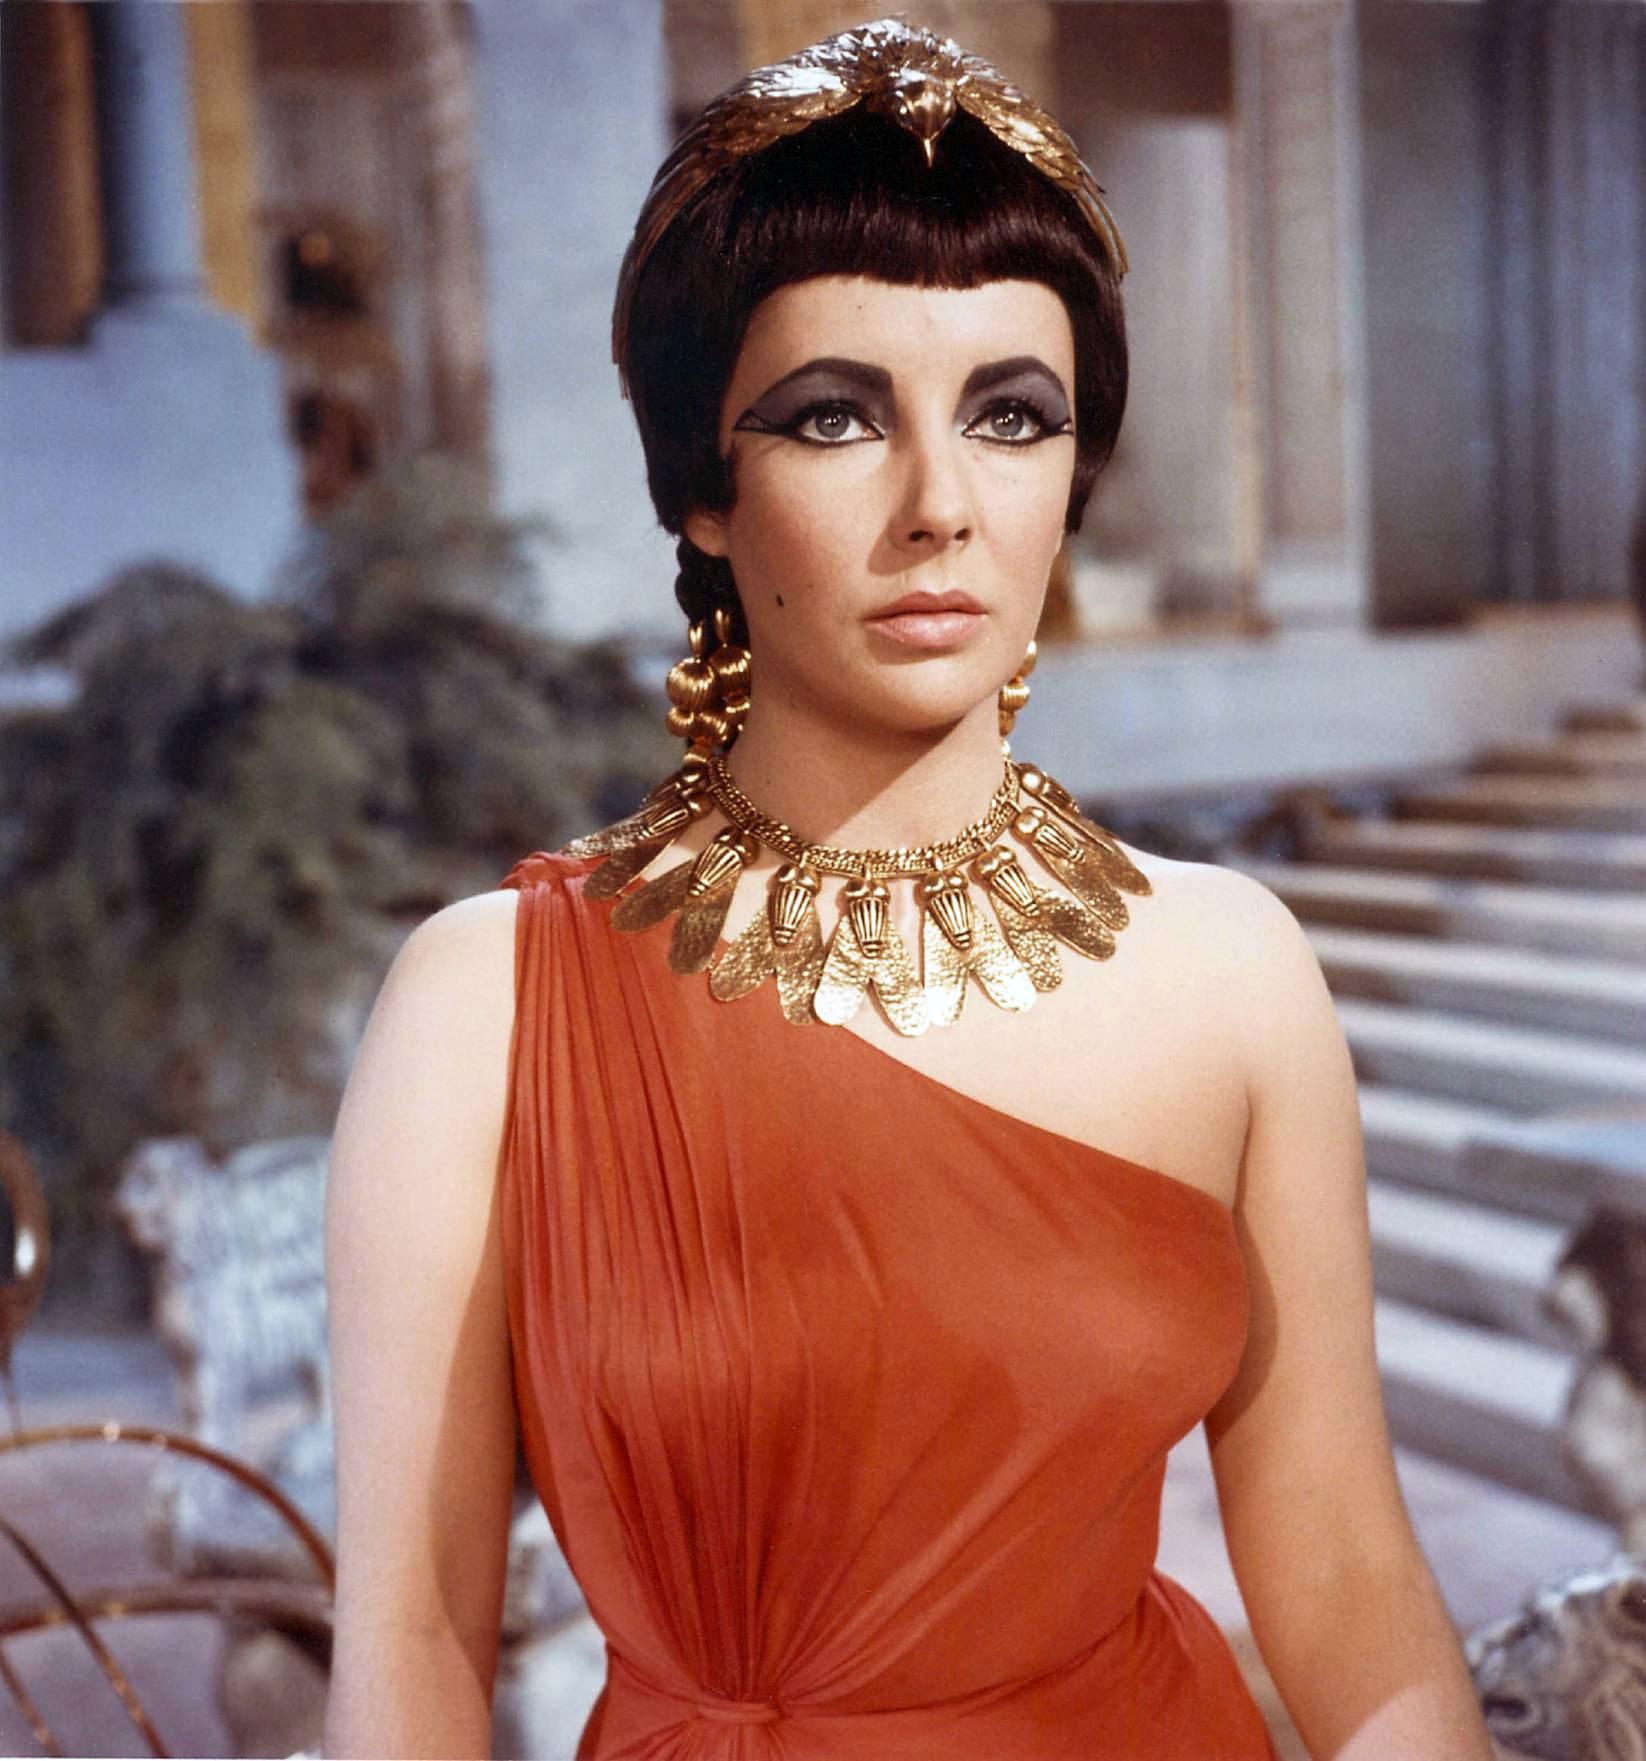 [Image: Annex%20-%20Taylor,%20Elizabeth%20(Cleopatra)_12.jpg]